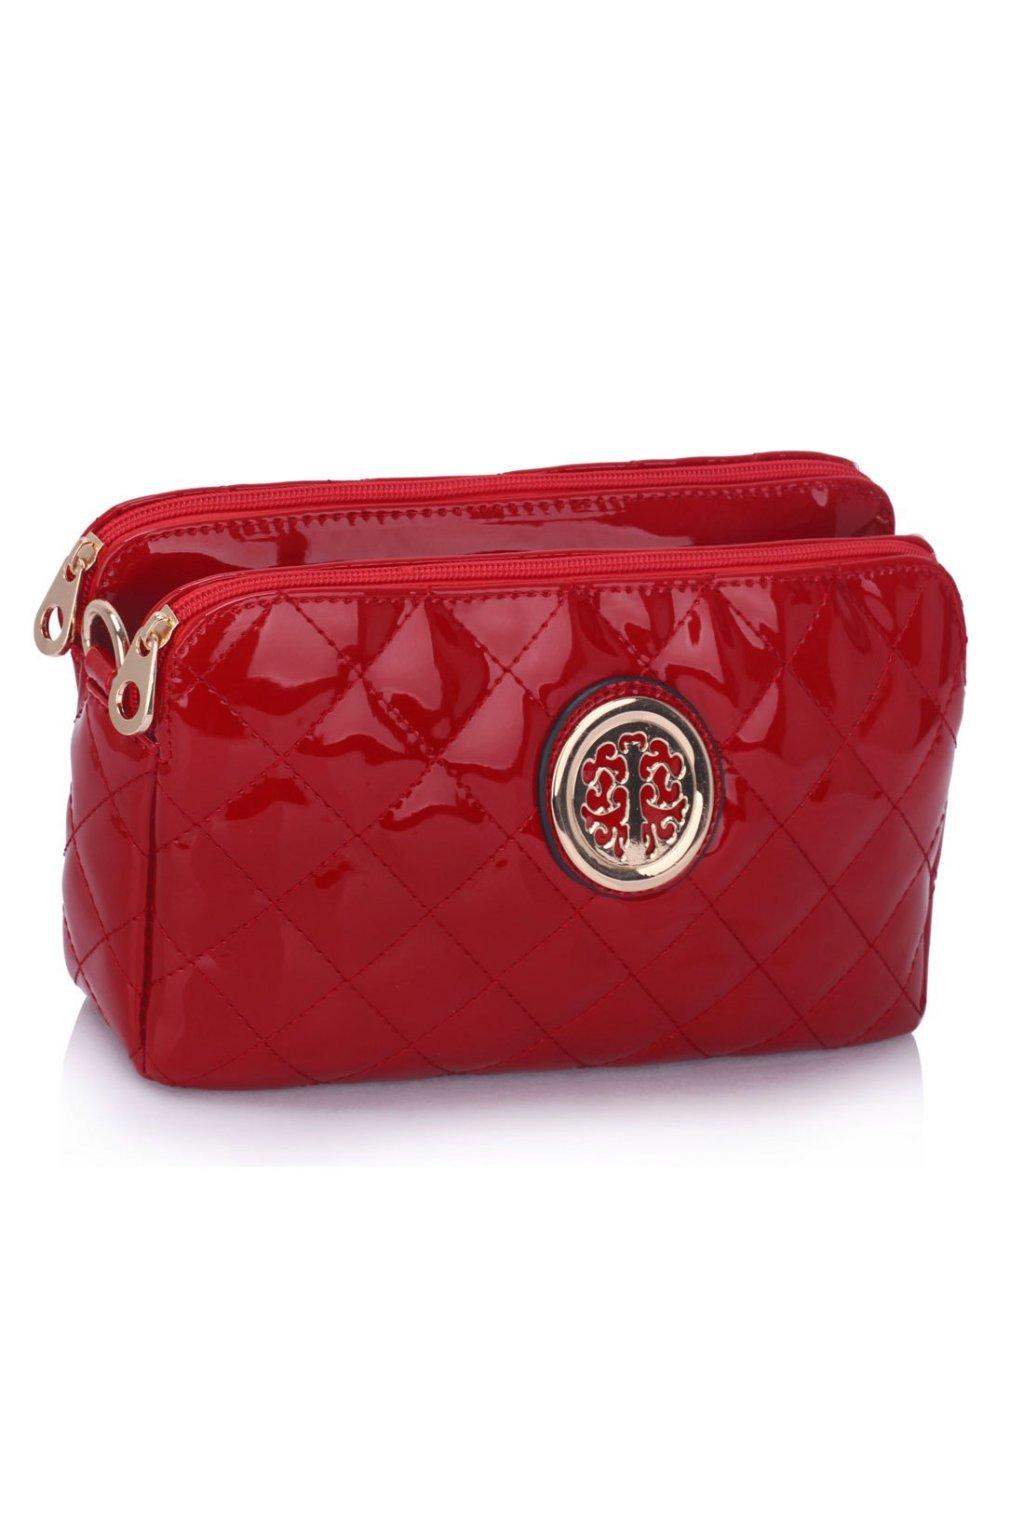 Crossbody kabelka Nadine červená LS00388